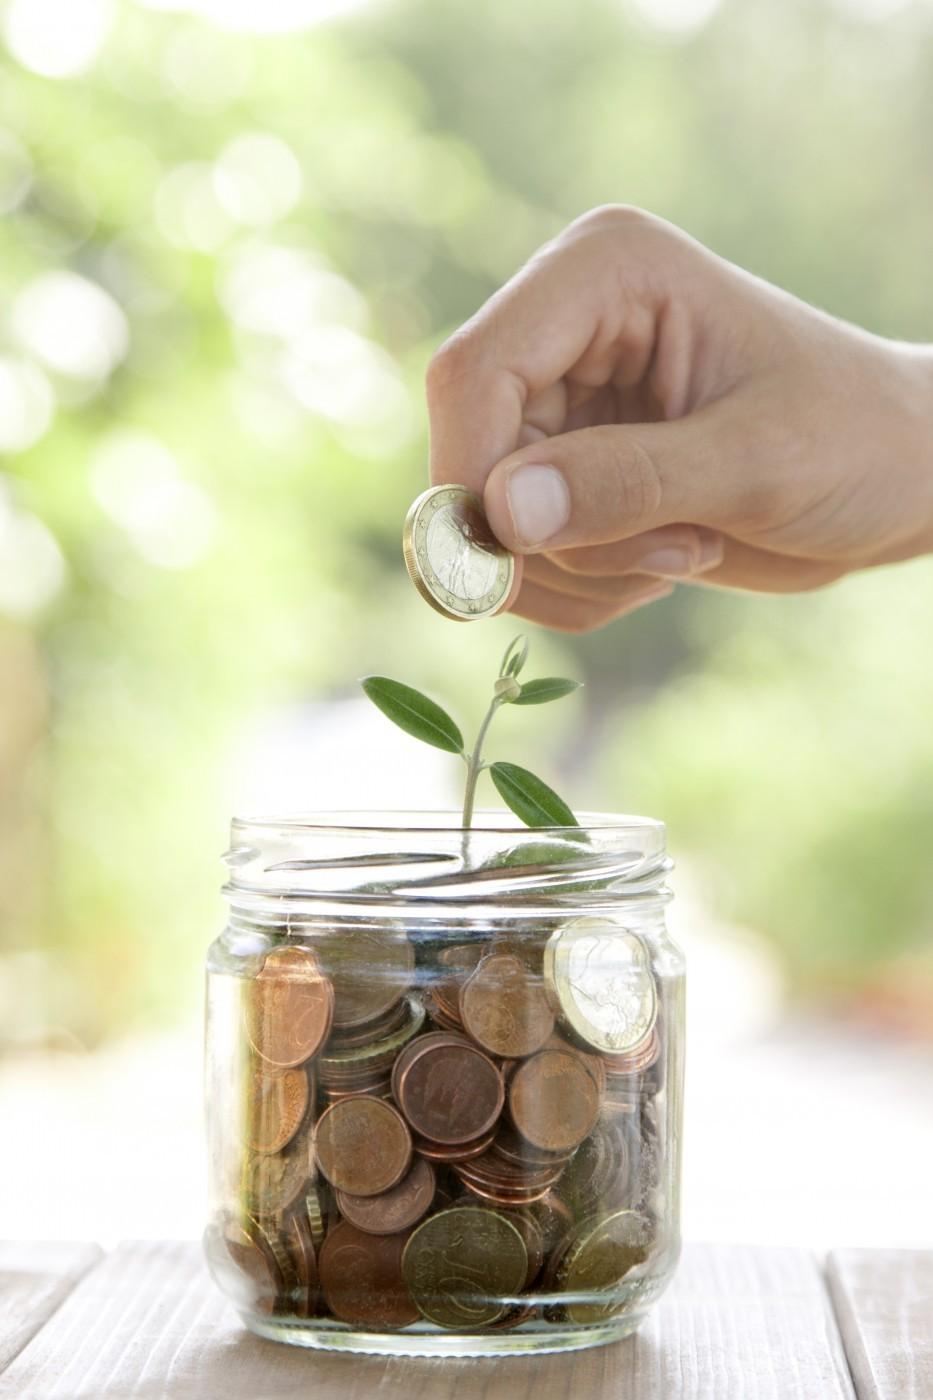 Blactower Financial Management